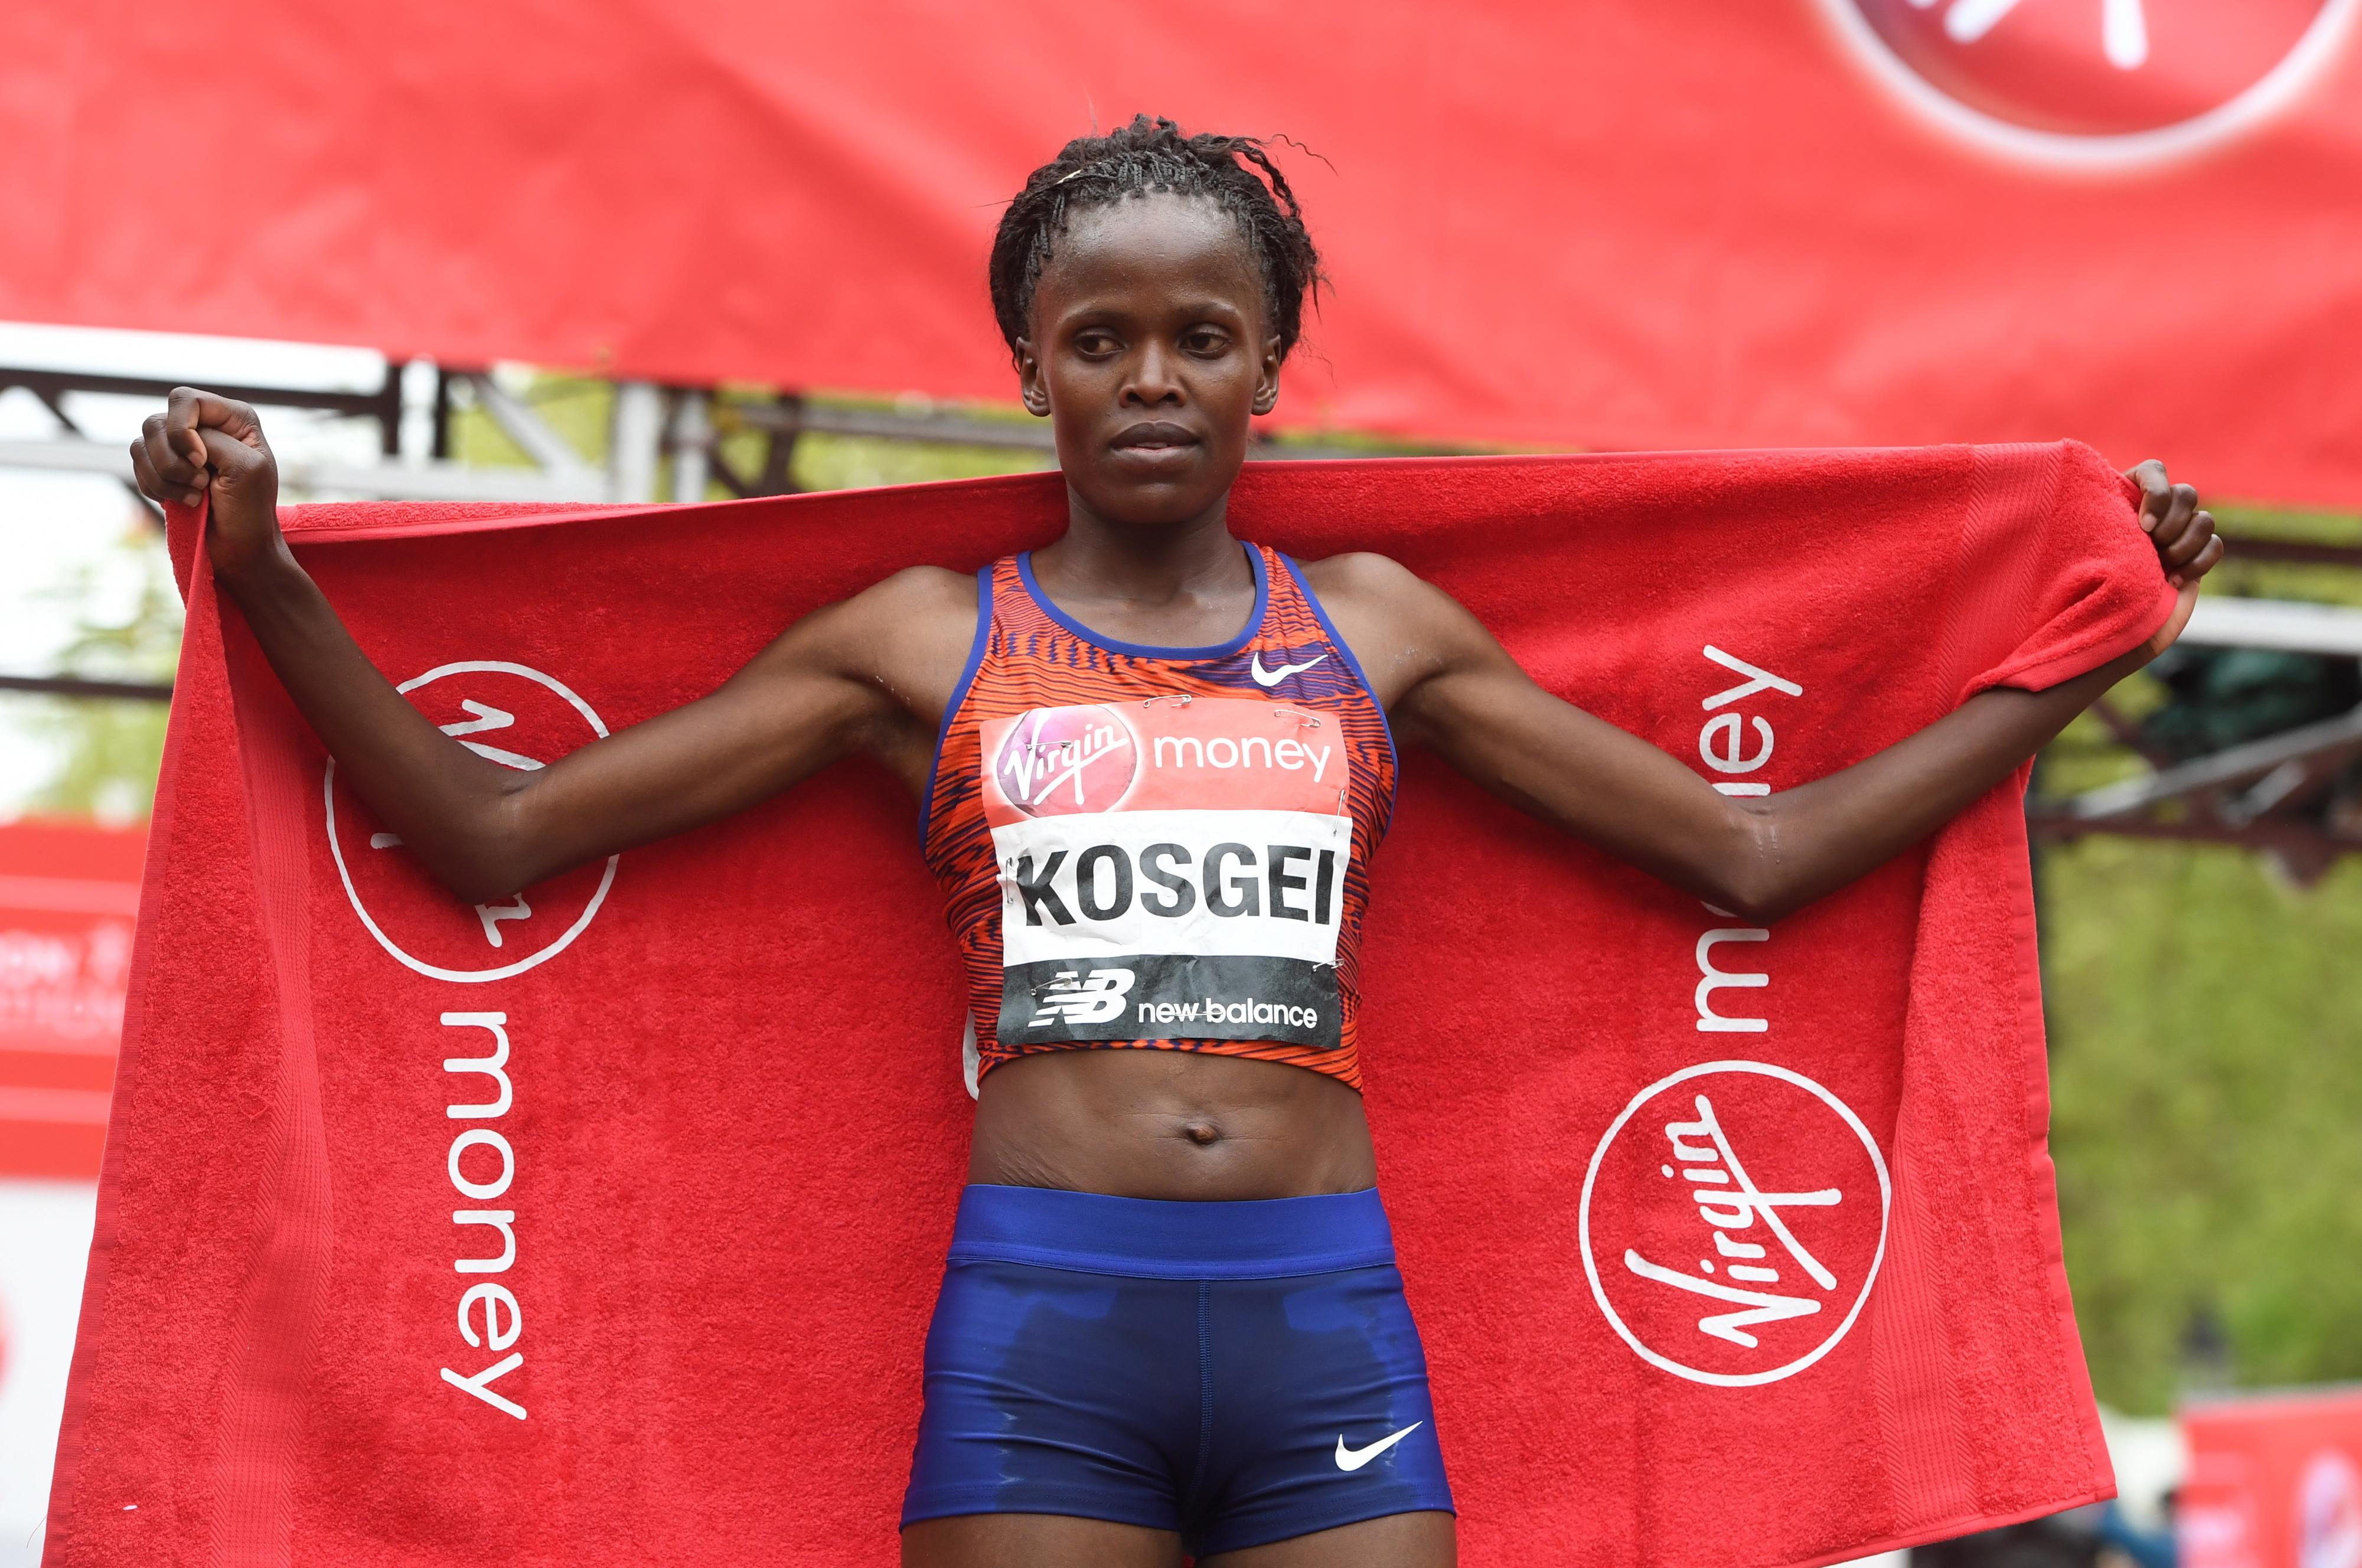 Queniana Brigid Kosgei bateu recorde da maratona que pertencia a Paula Radcliffe